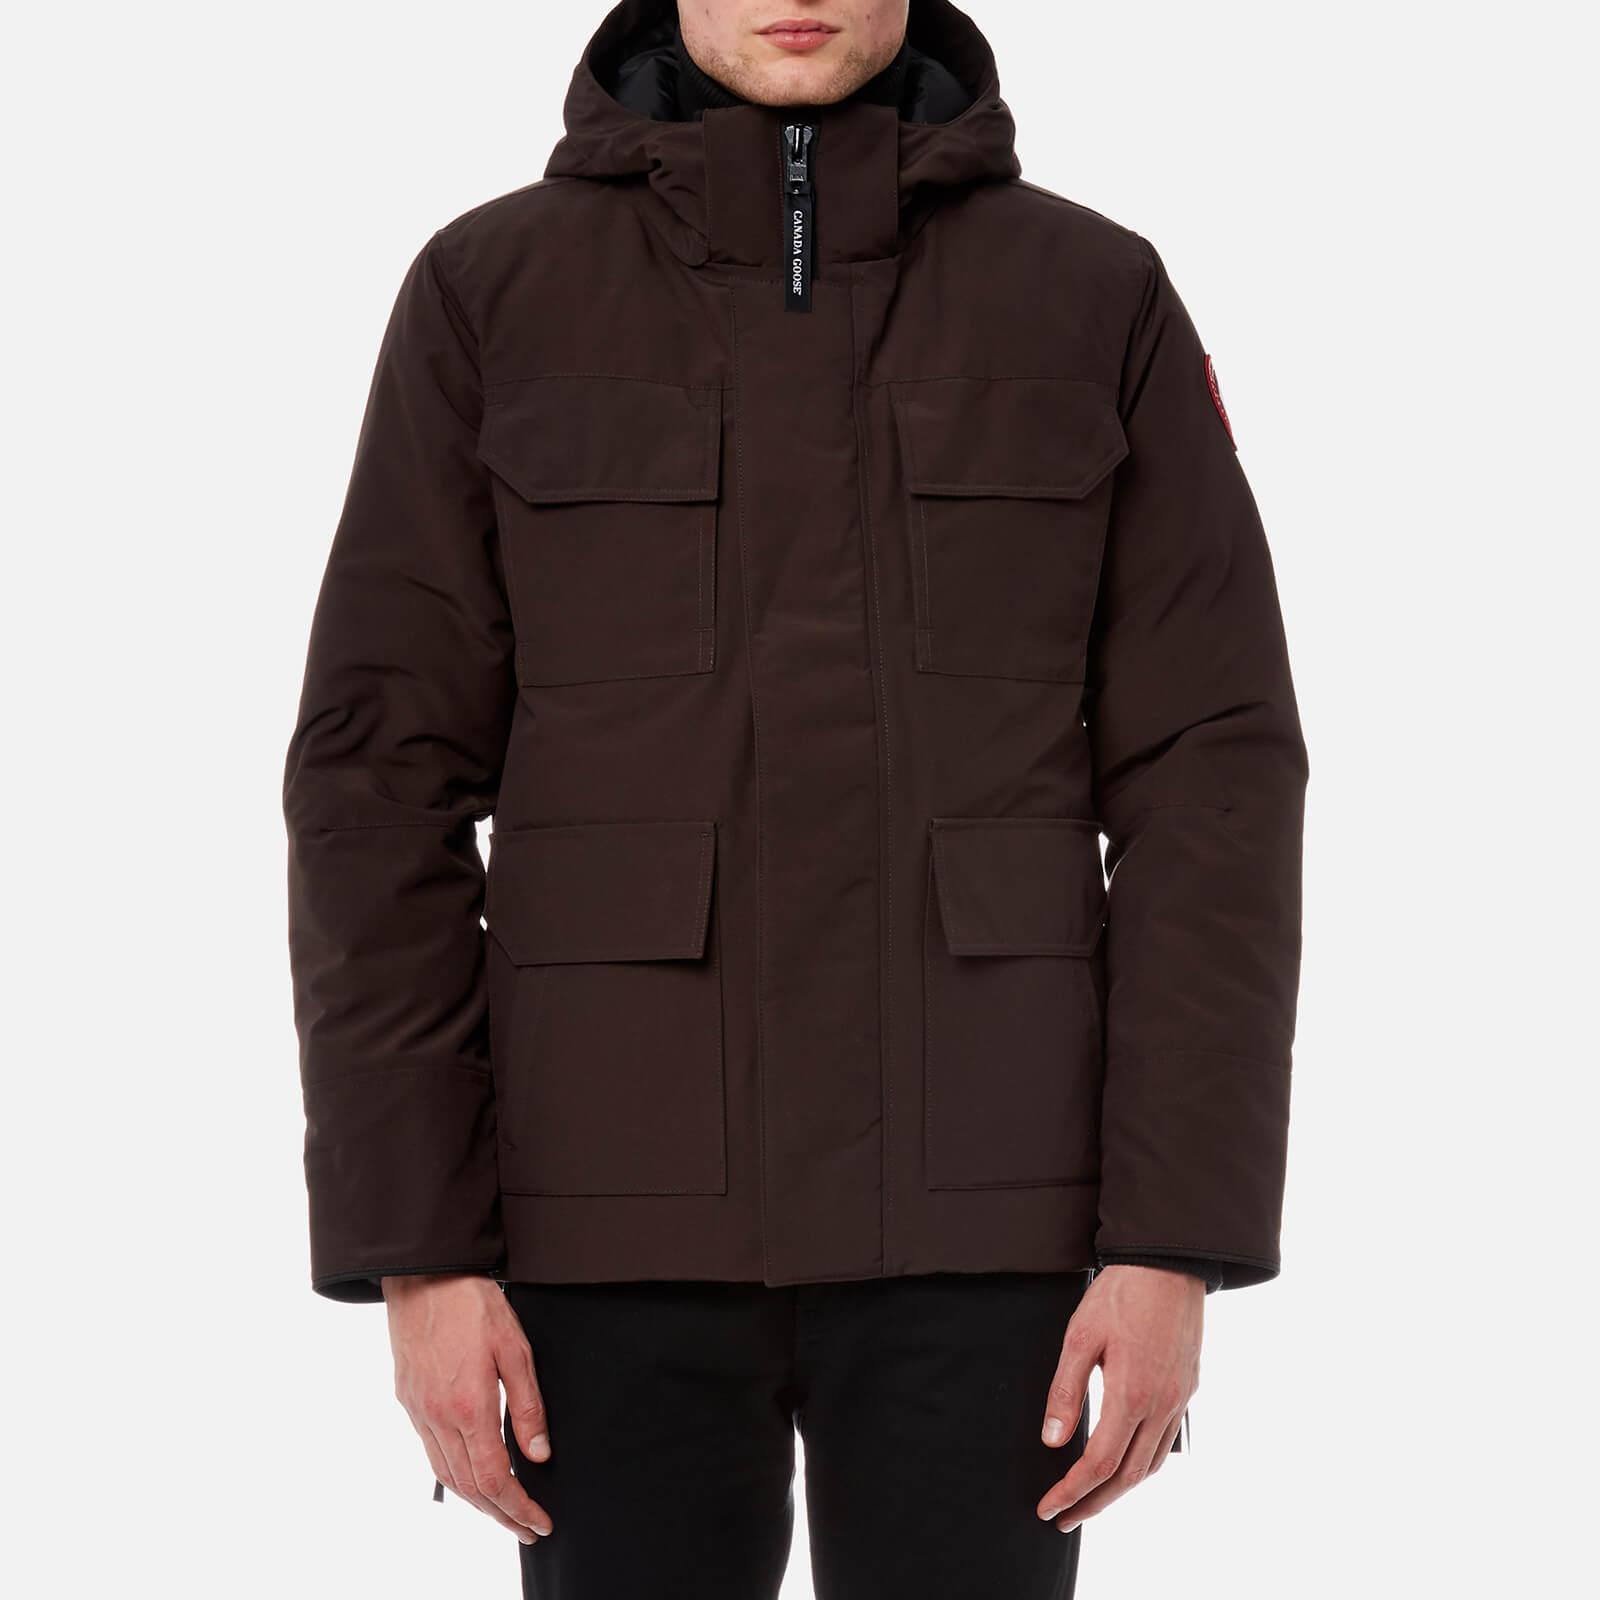 ff7ac0443ed Canada Goose Men's Maitland Parka Jacket - Charred Wood - Free UK Delivery  over £50